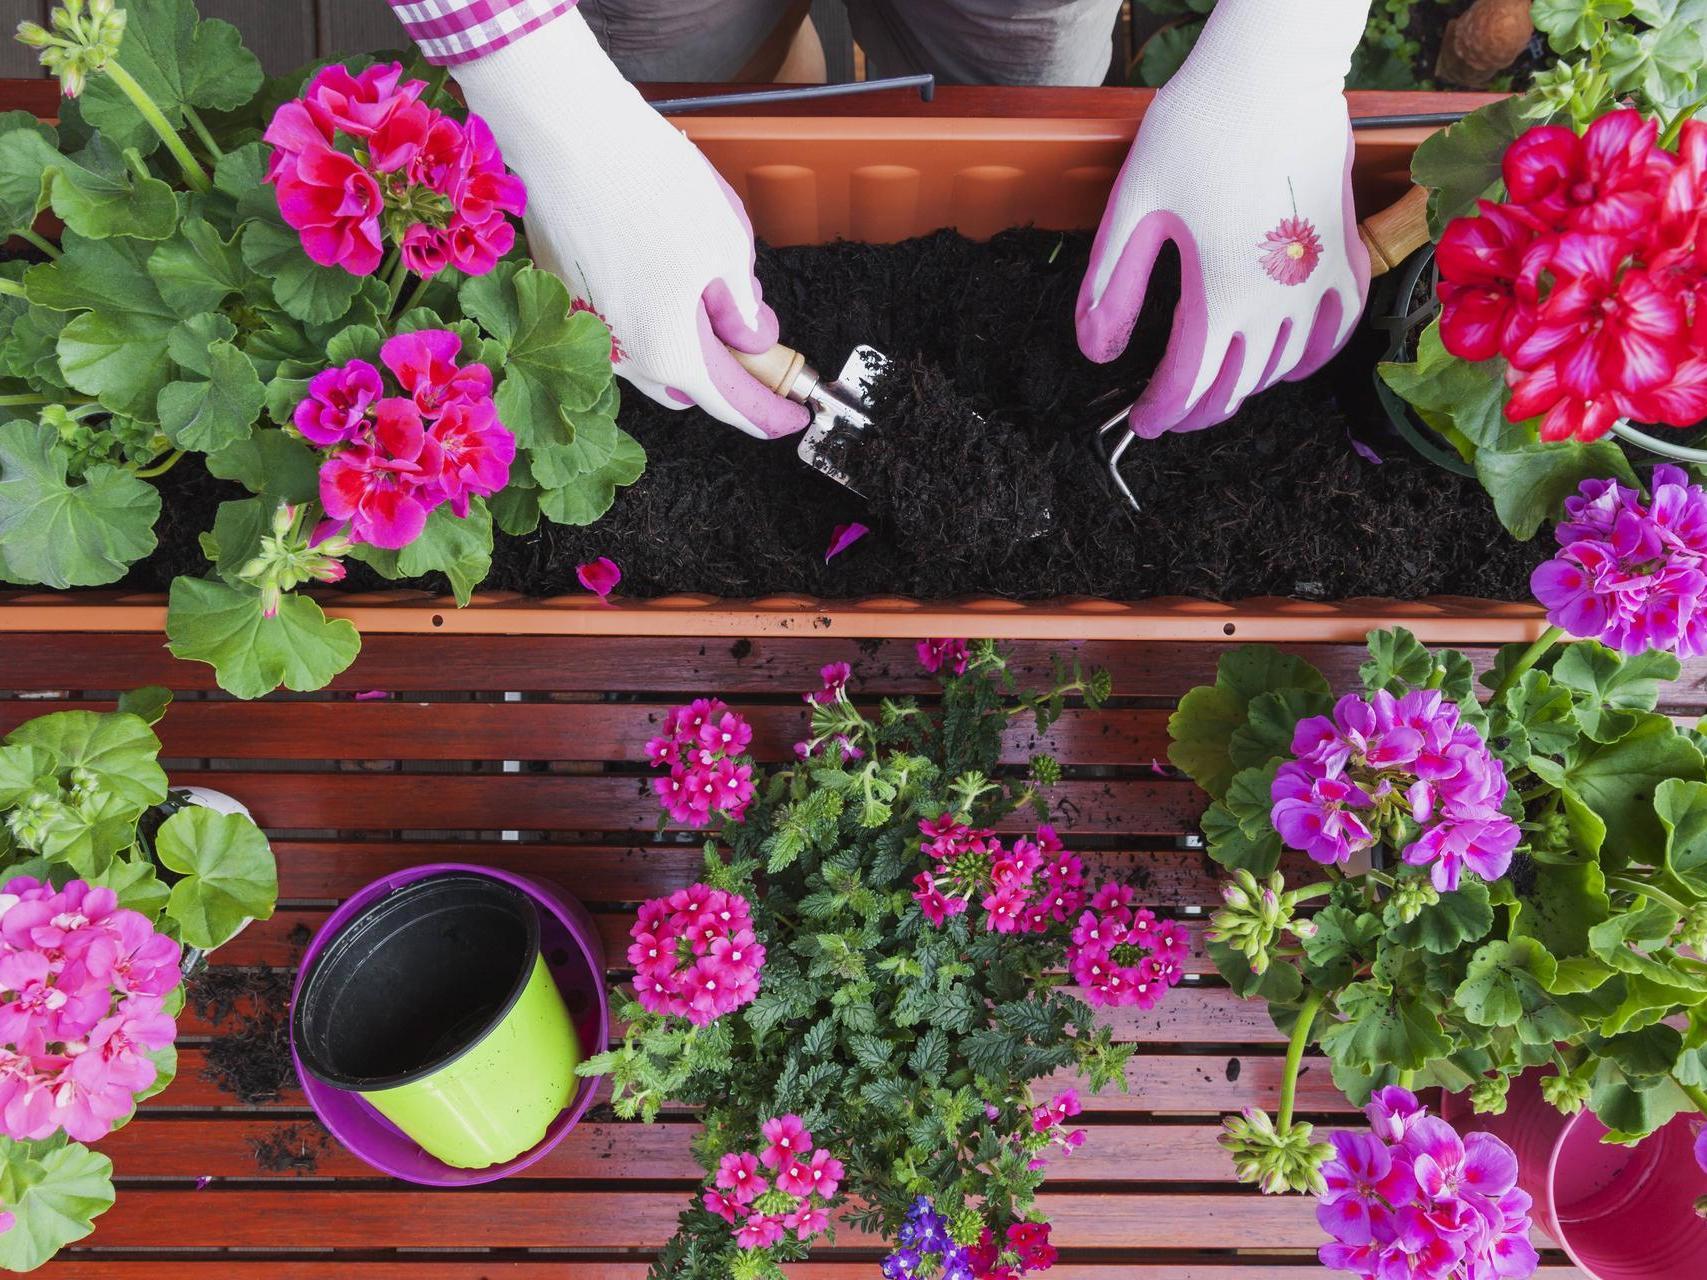 Full Size of Bewässerung Balkon Balkonpflanzen Richtig Setzen Und Pflegen Tipps Bewässerungssysteme Garten Bewässerungssystem Test Automatisch Wohnzimmer Bewässerung Balkon